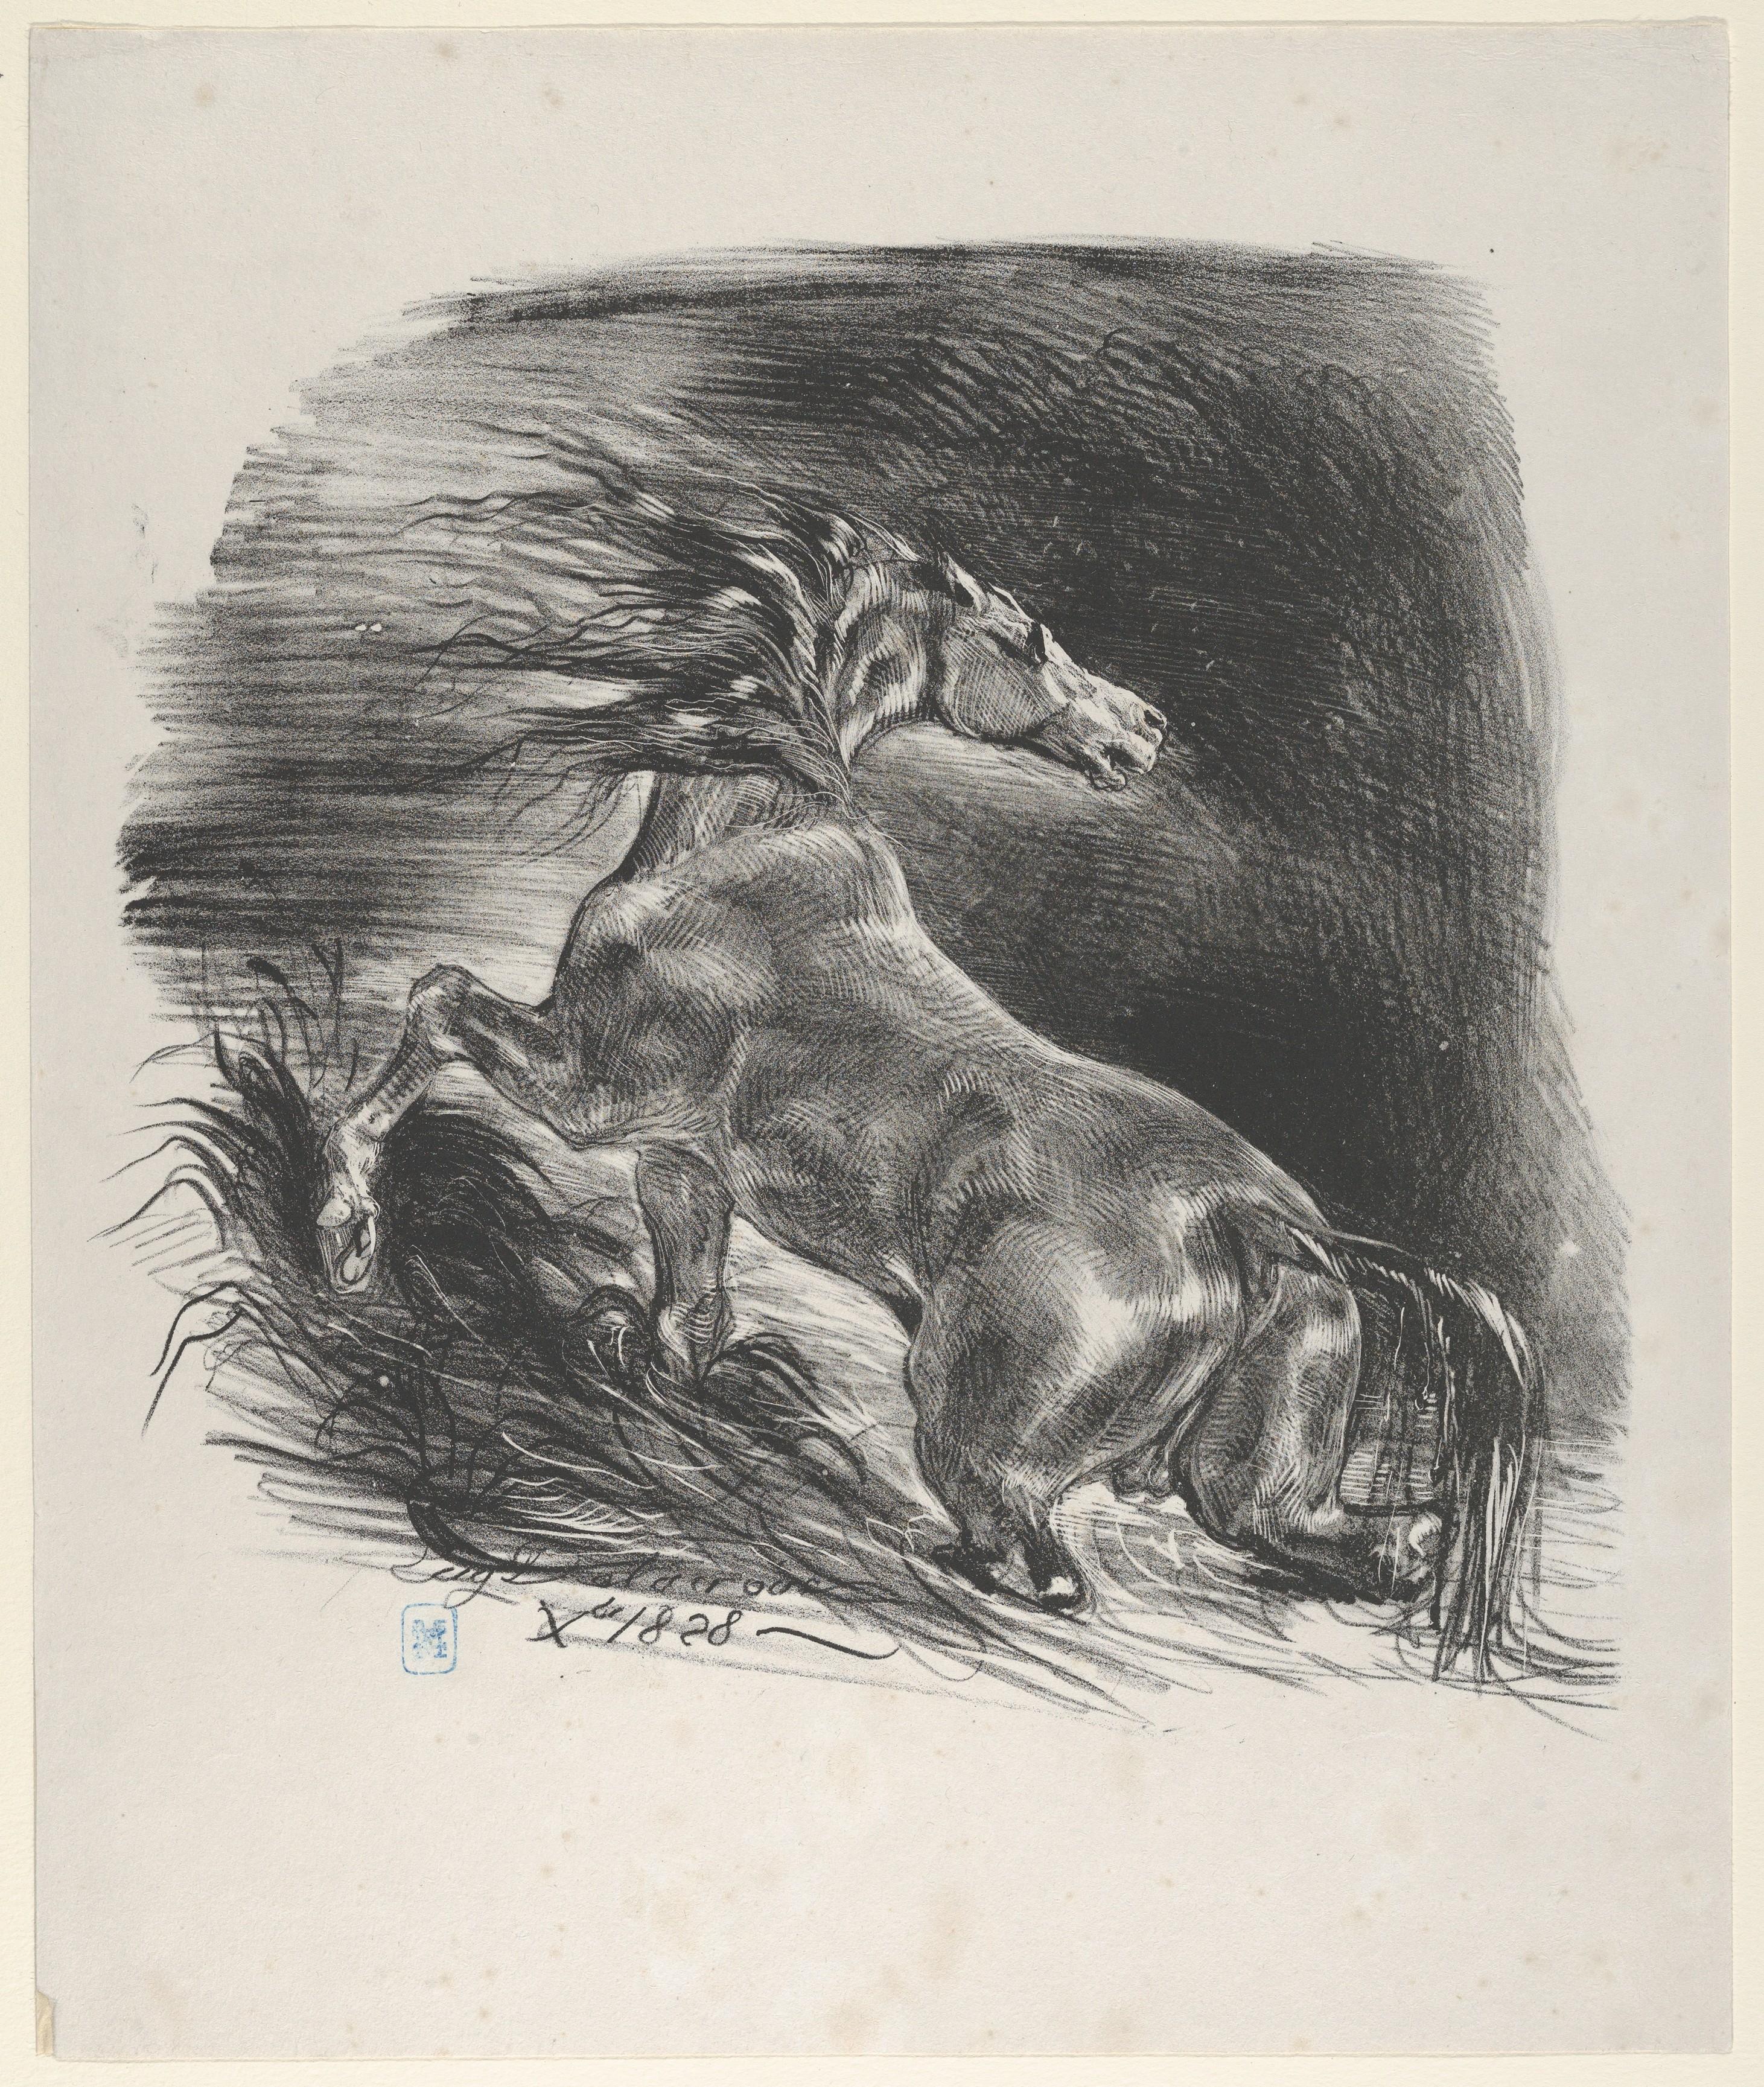 Eugene Delacroix Wild Horse The Metropolitan Museum Of Art